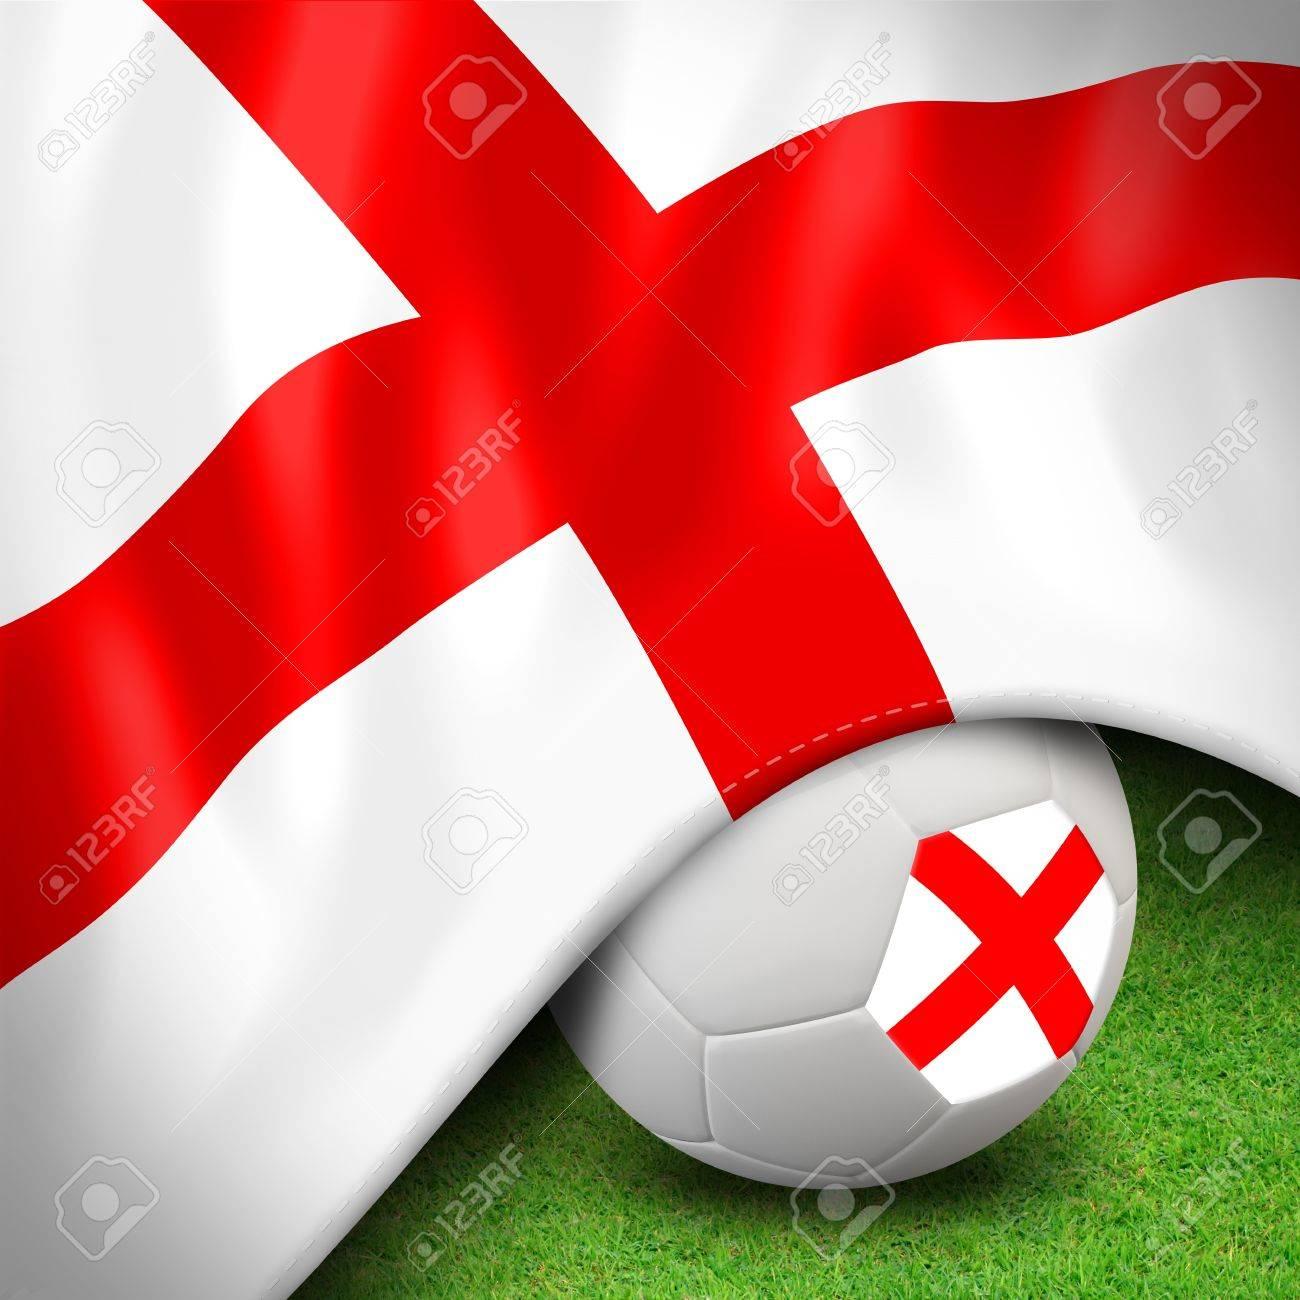 Soccer ball and flag euro england Stock Photo - 12842378